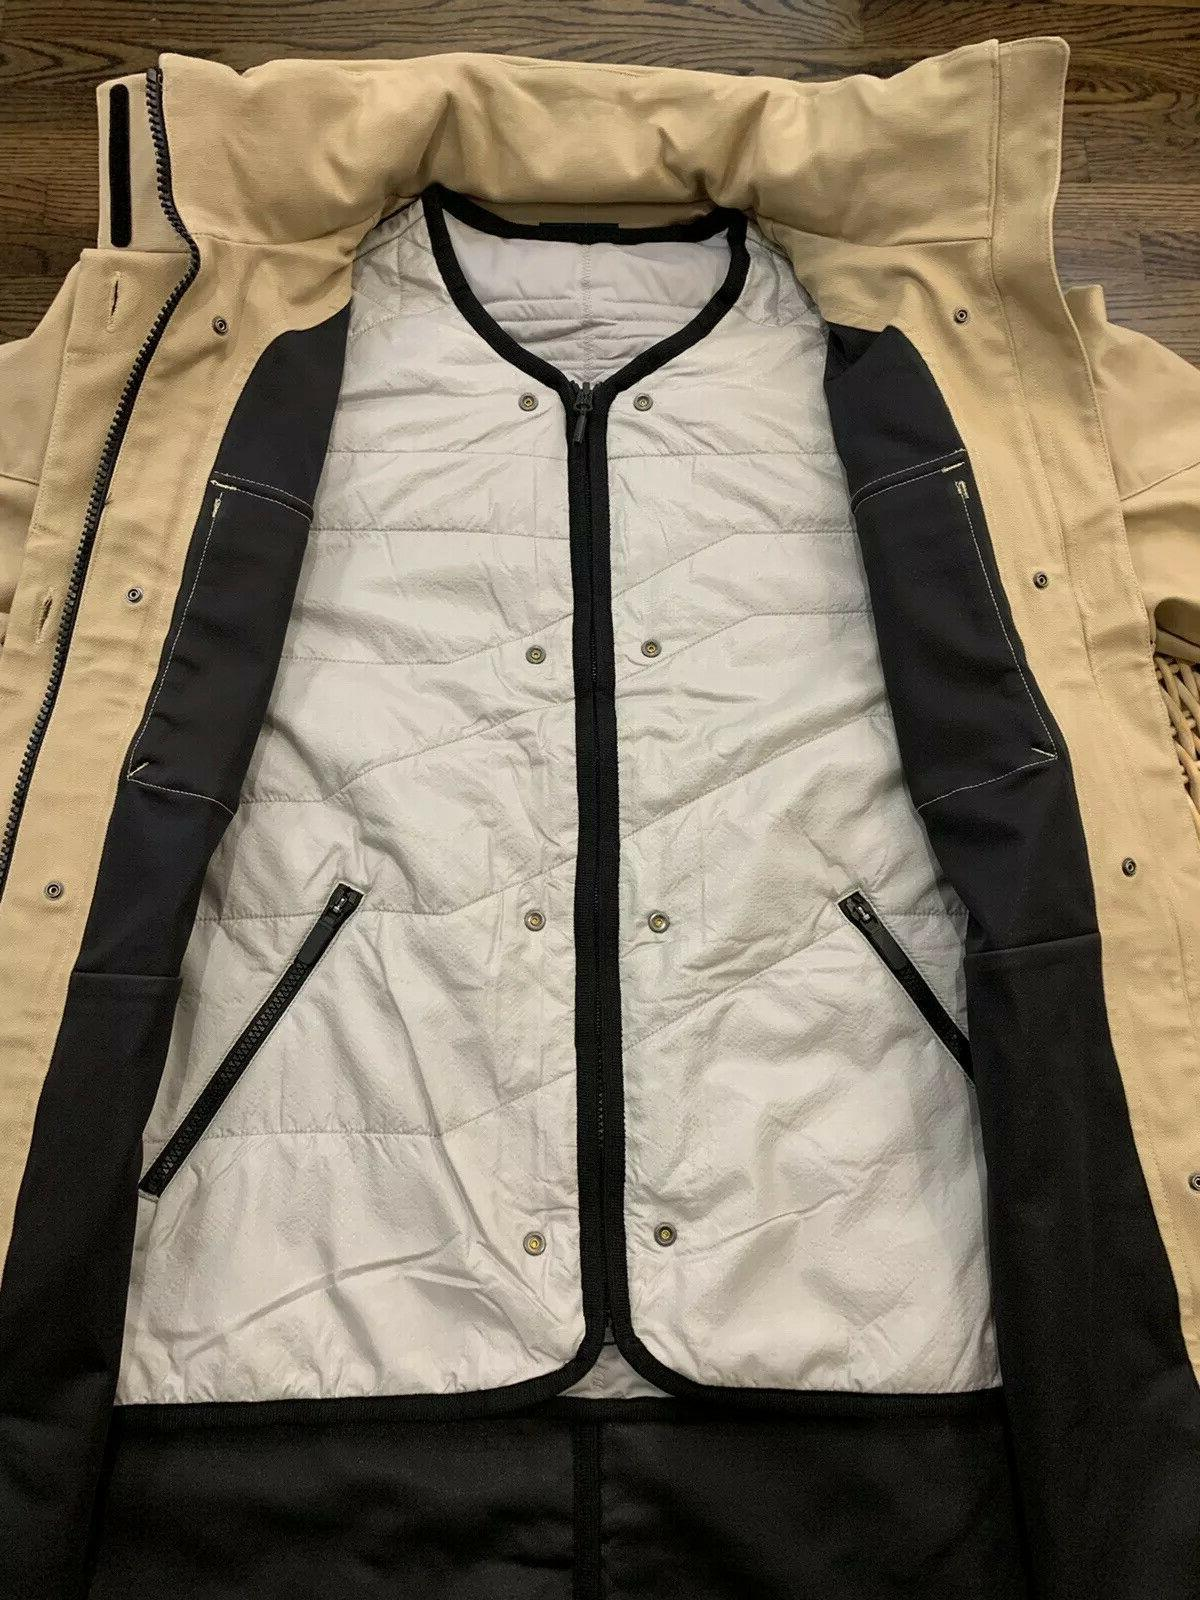 Under Washed 3-in-1 Parka Jacket Tan Size Large